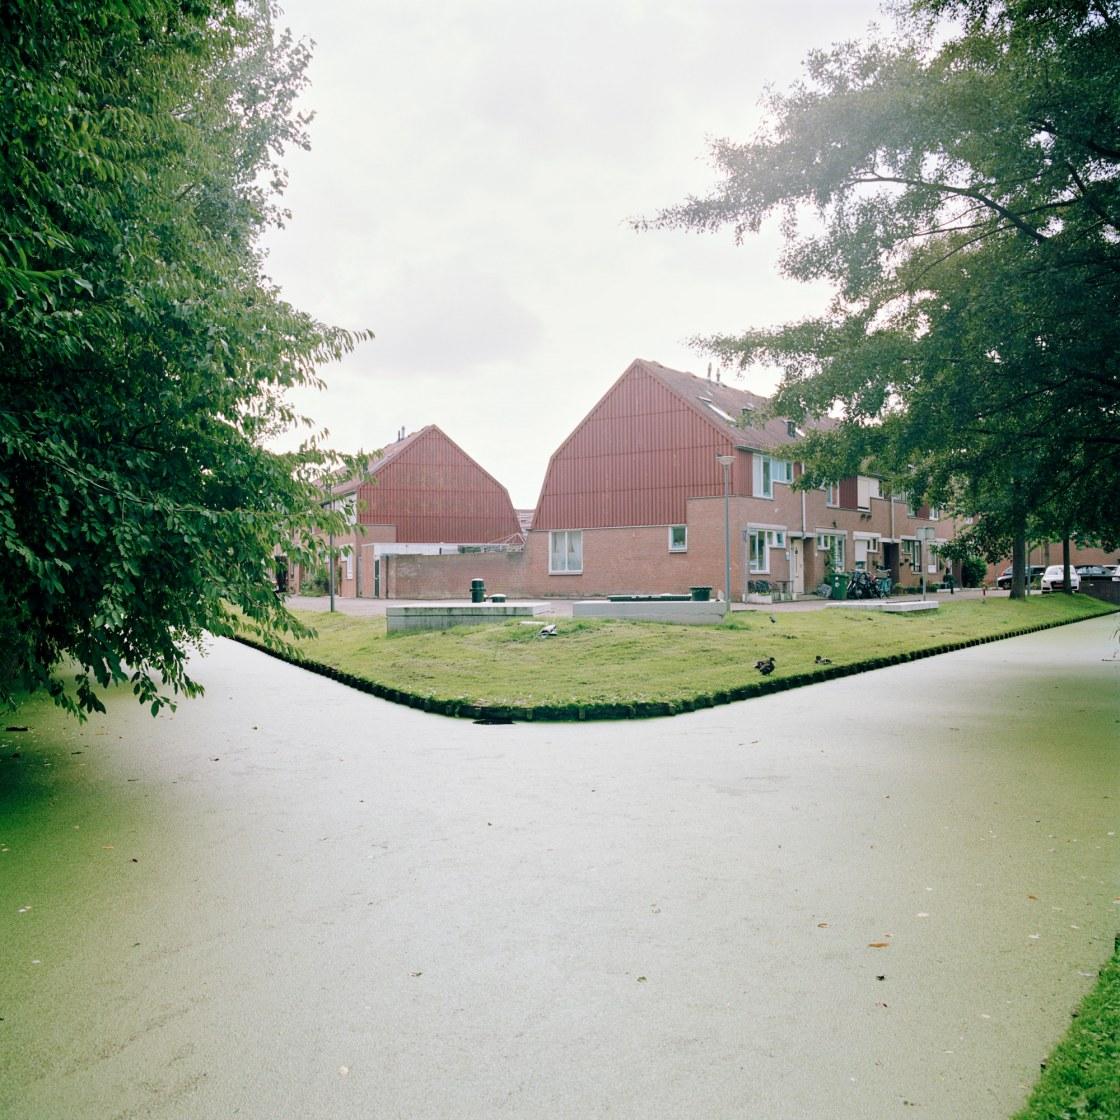 VERS_BETON_ZUZANA_06_WEB_Willem de Kam